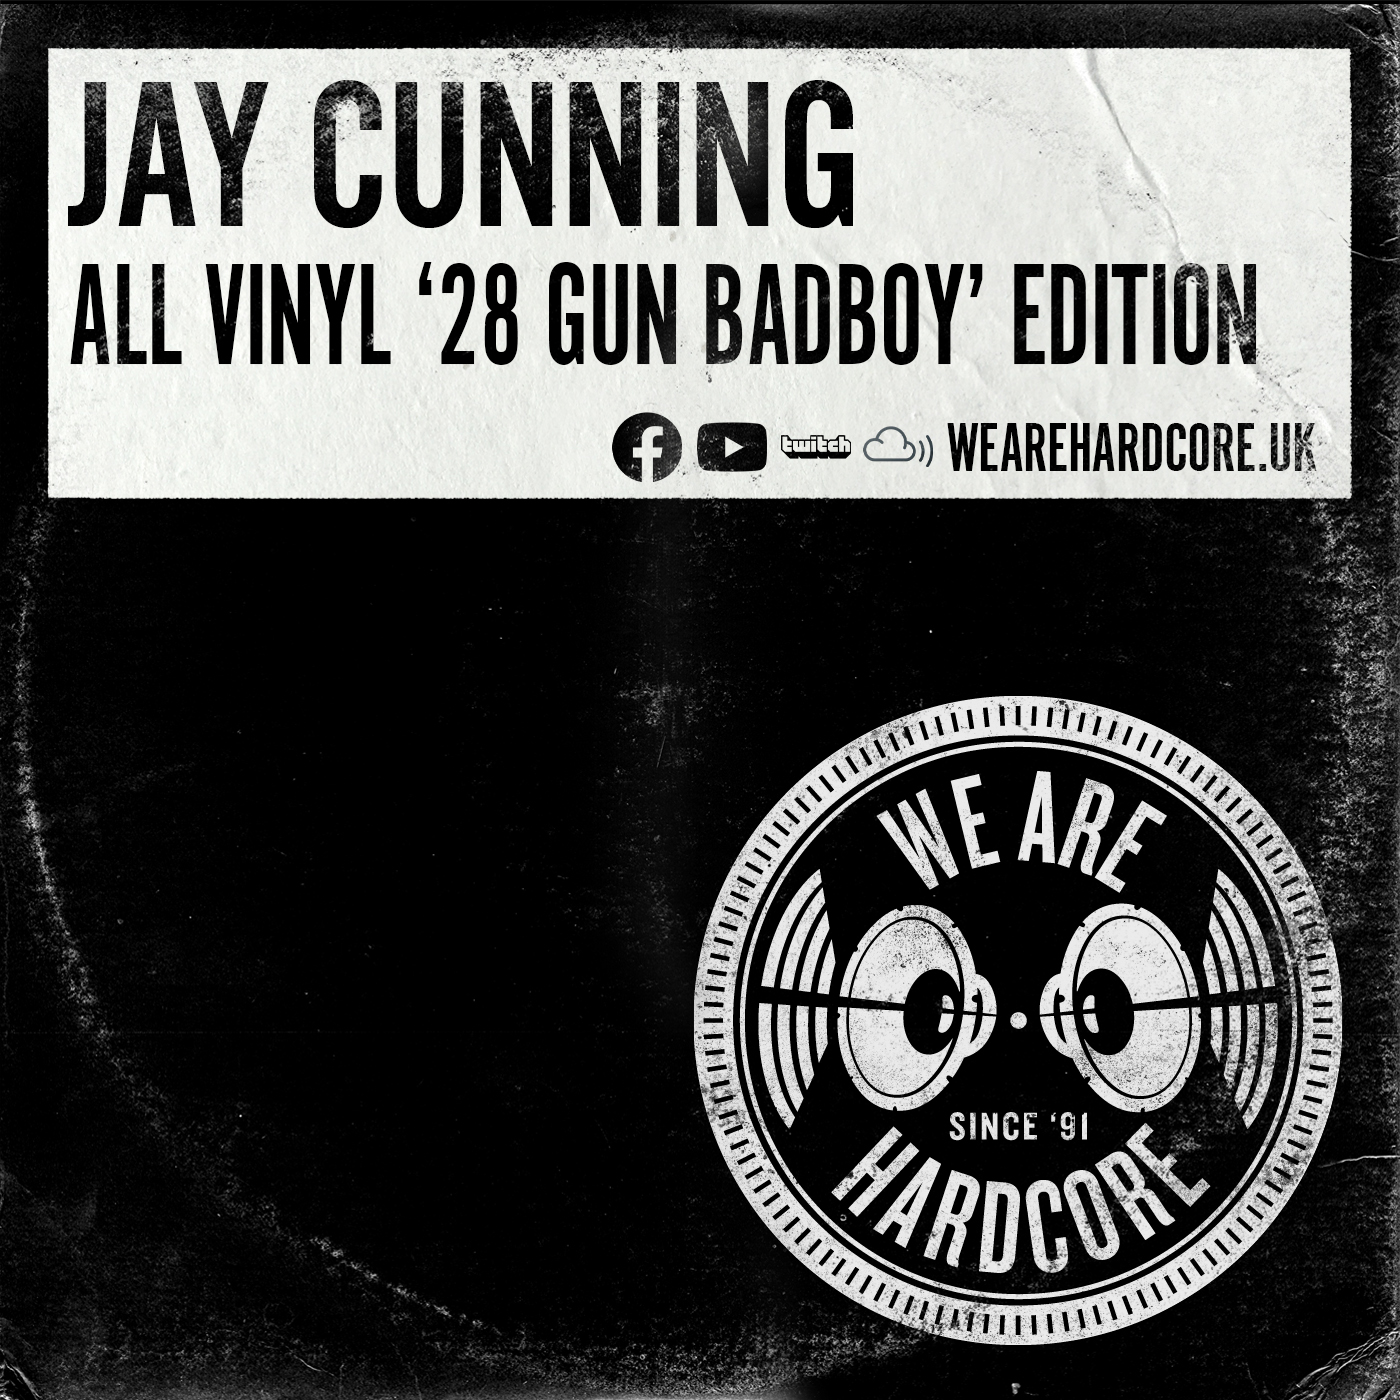 All Vinyl '28 Gun Badboy' Edition - Jay Cunning - WE ARE HARDCORE